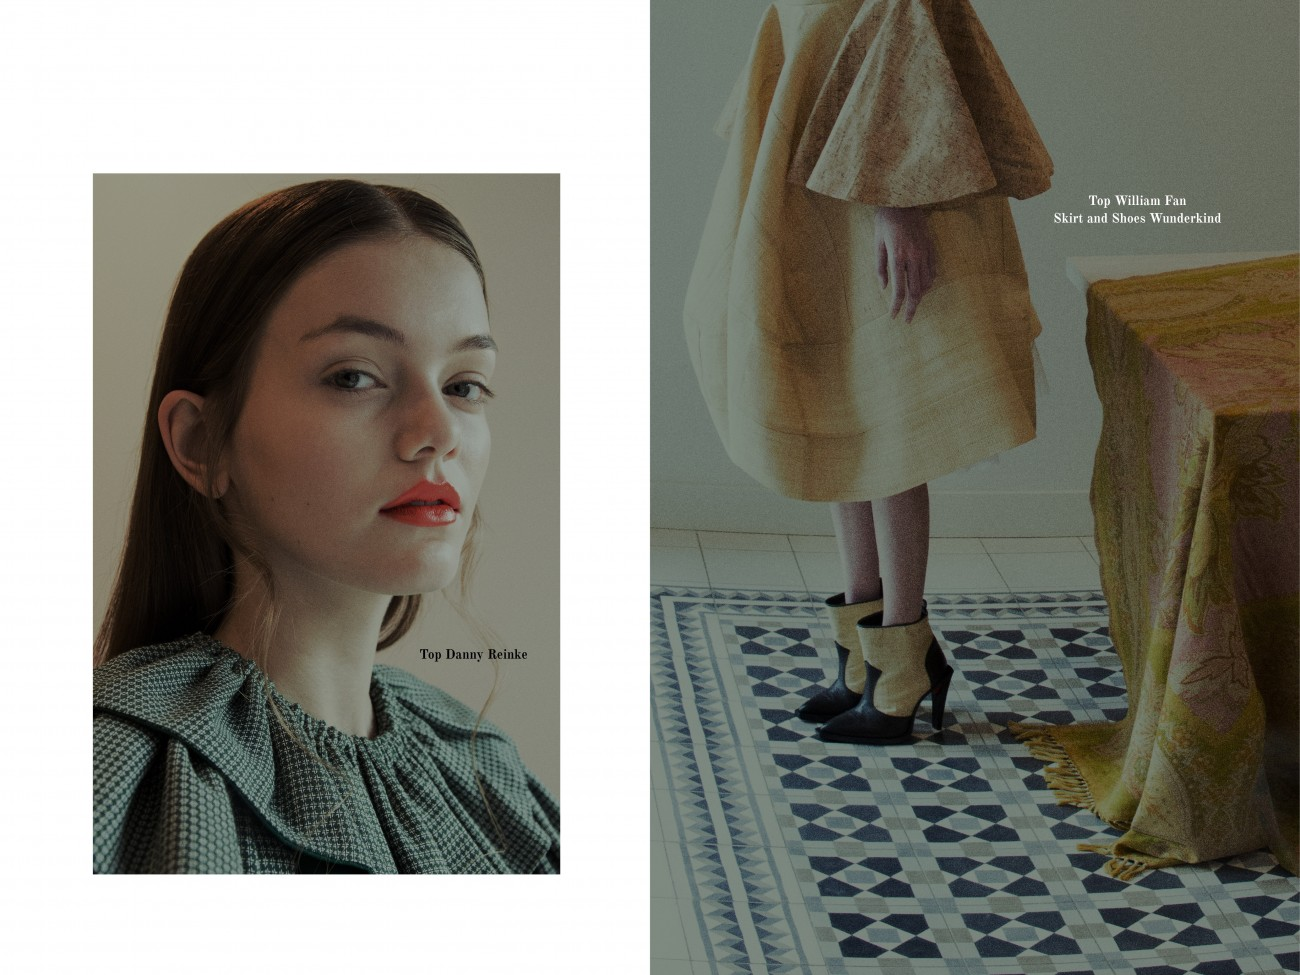 Loreen-Hinz-I-Cannot-Tell-My-Secrets-OE-Magazine06